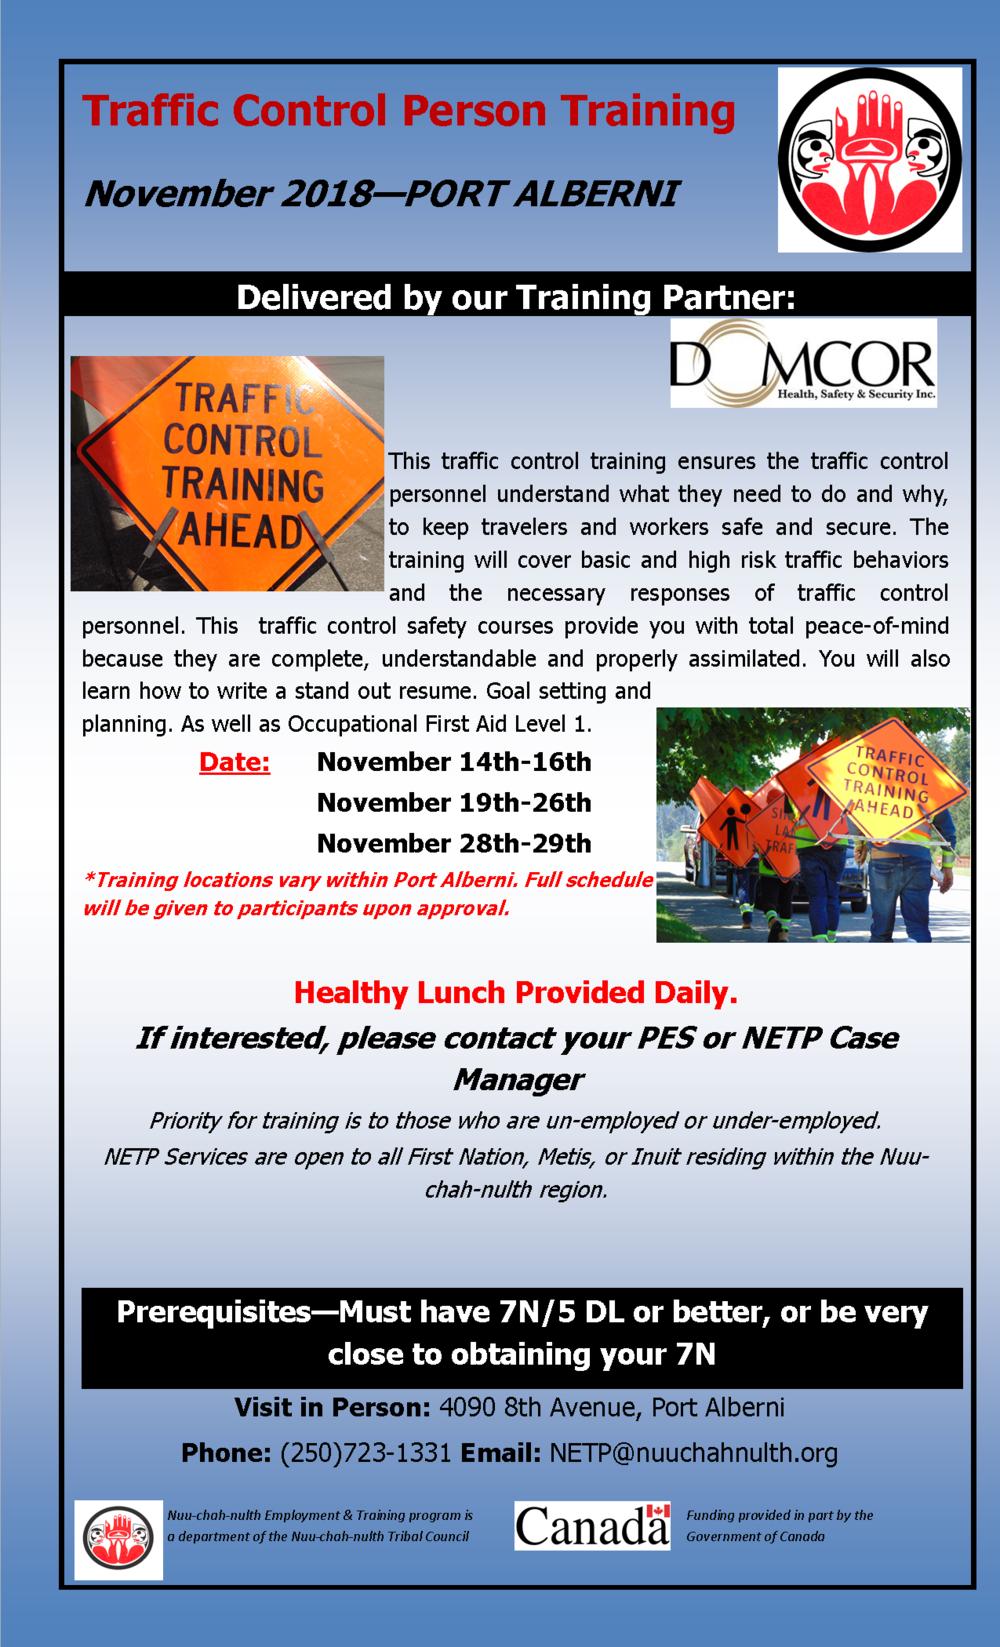 Traffic Control Training Nov 2018 1.png